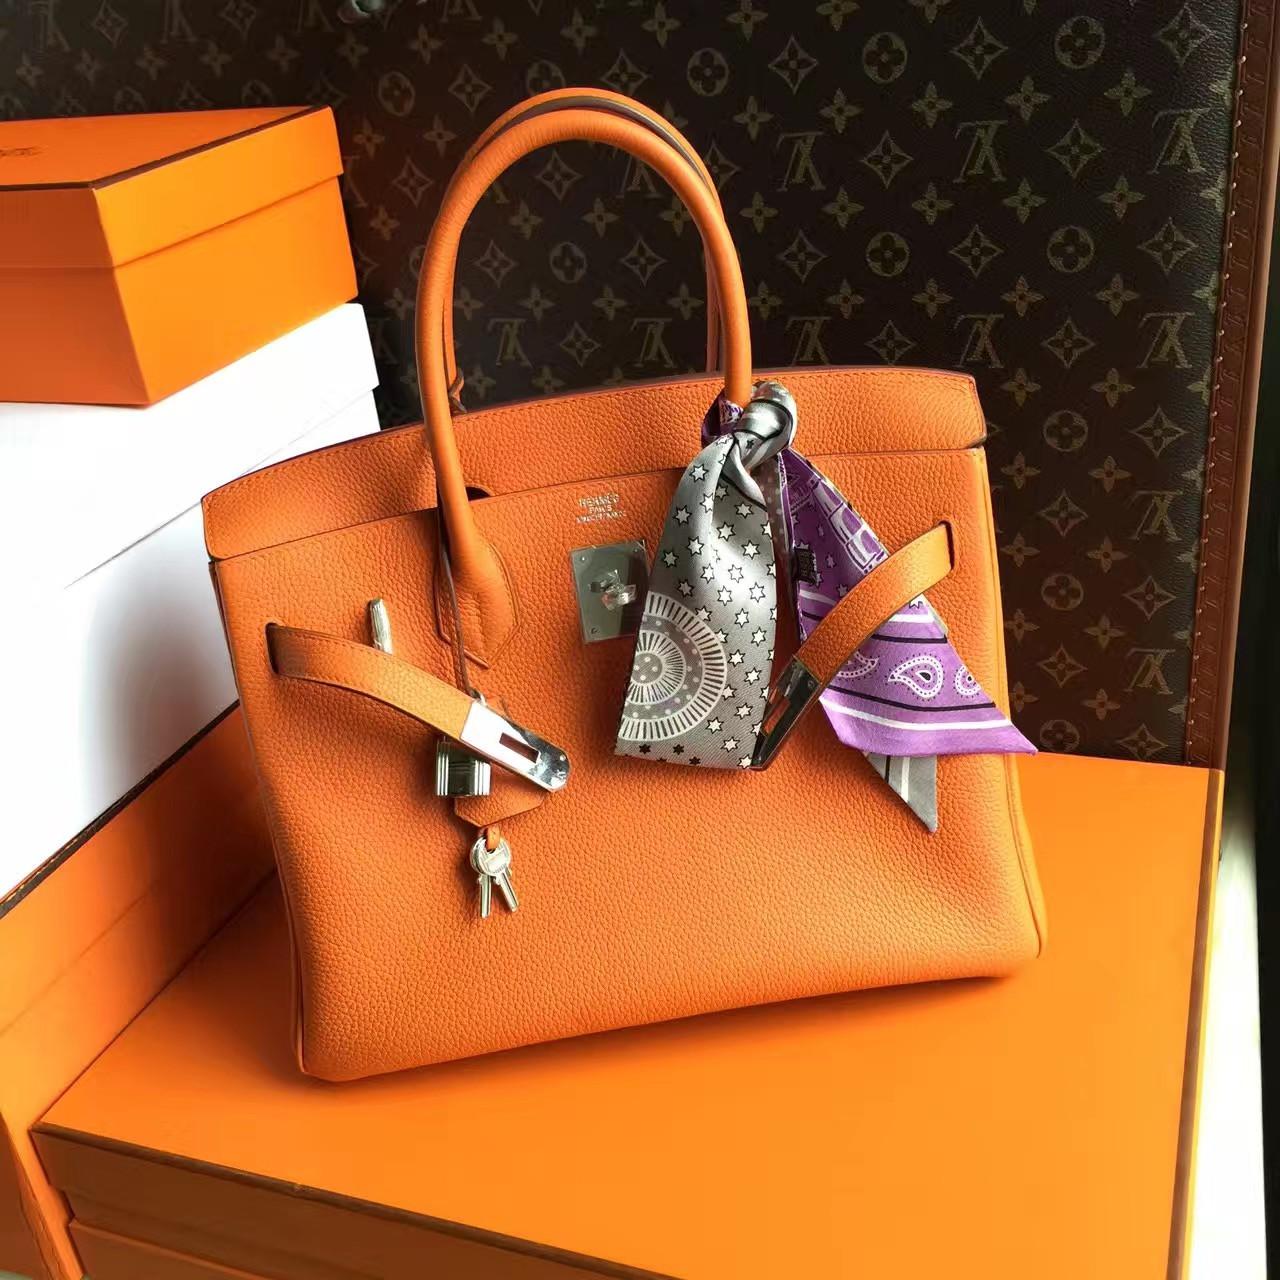 Hermes Orange Birkin Bag 30cm Palladium Hardware a33c92328db5